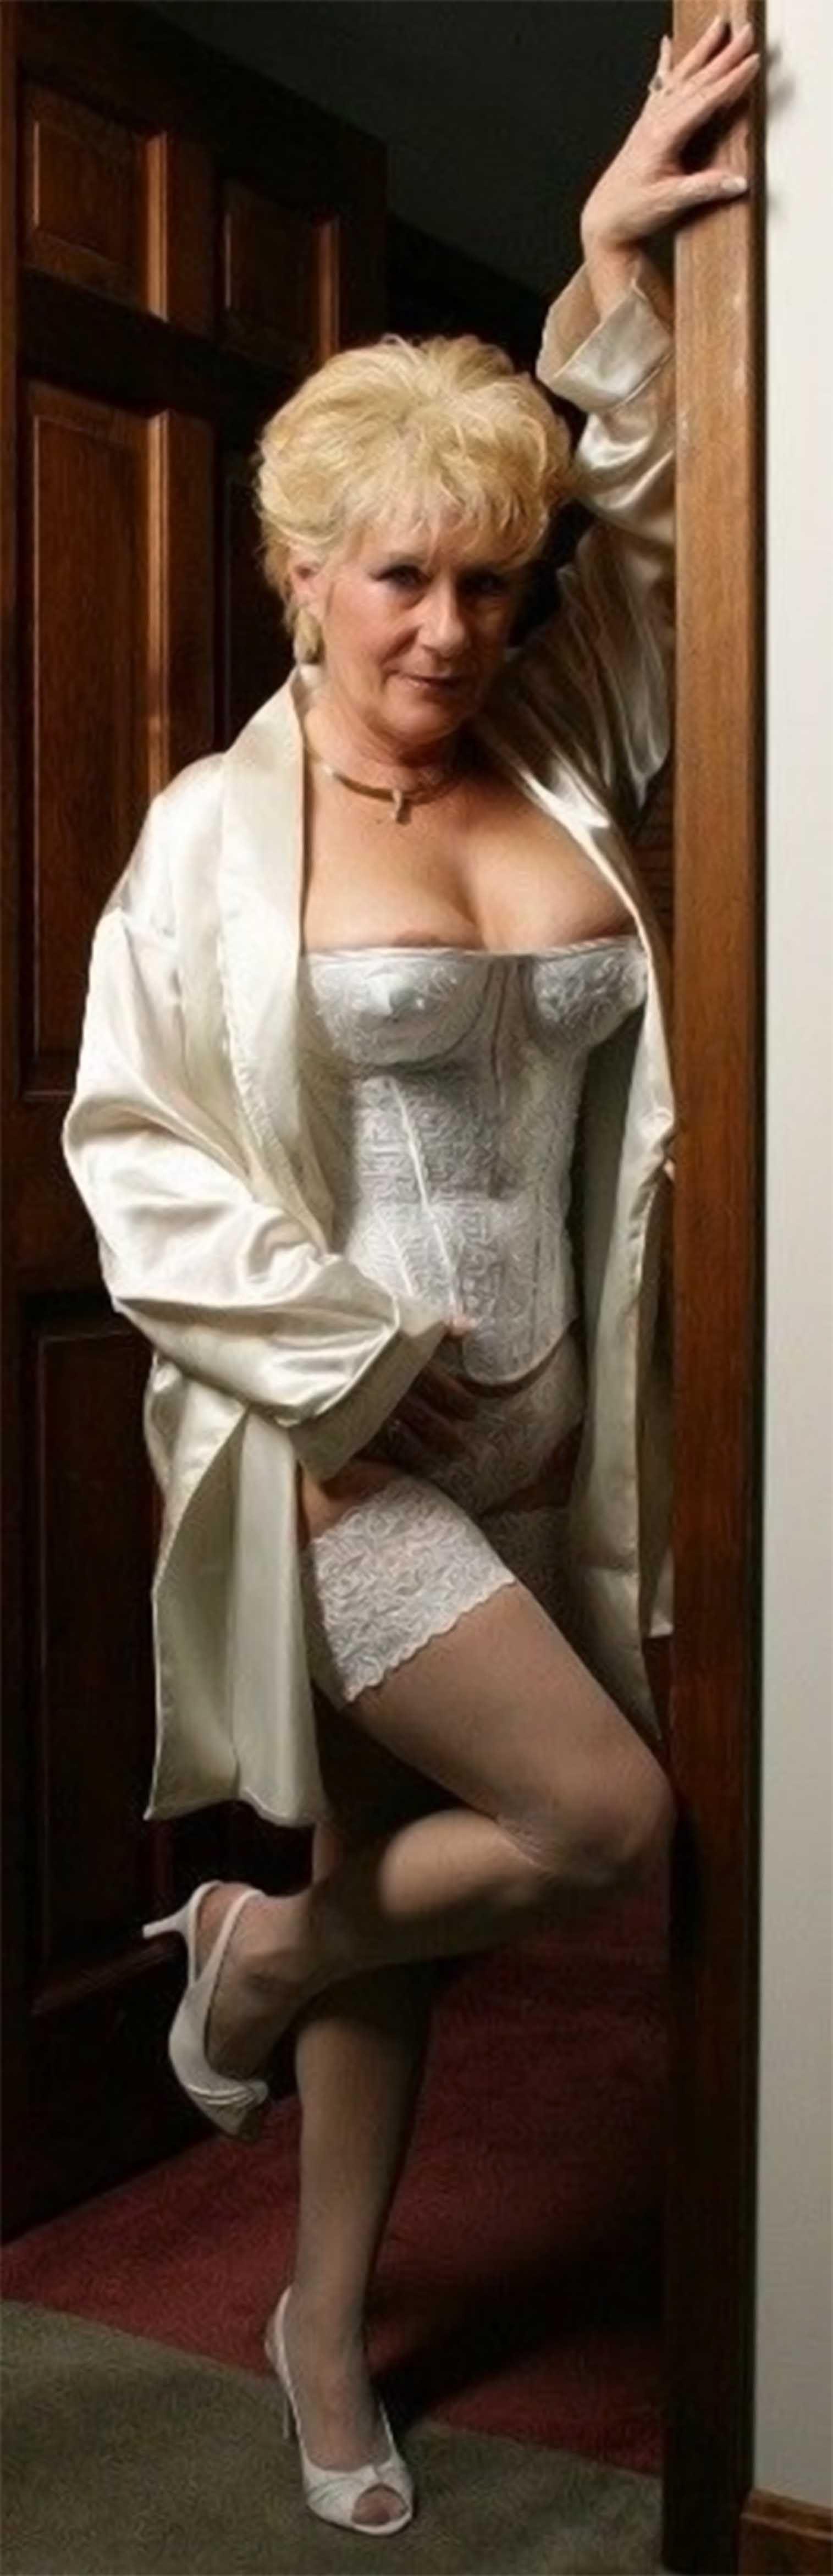 Sexy Elegant Elegant Lingerie Elegant Granny Sexy Lingerie Granny VGUqpzMS